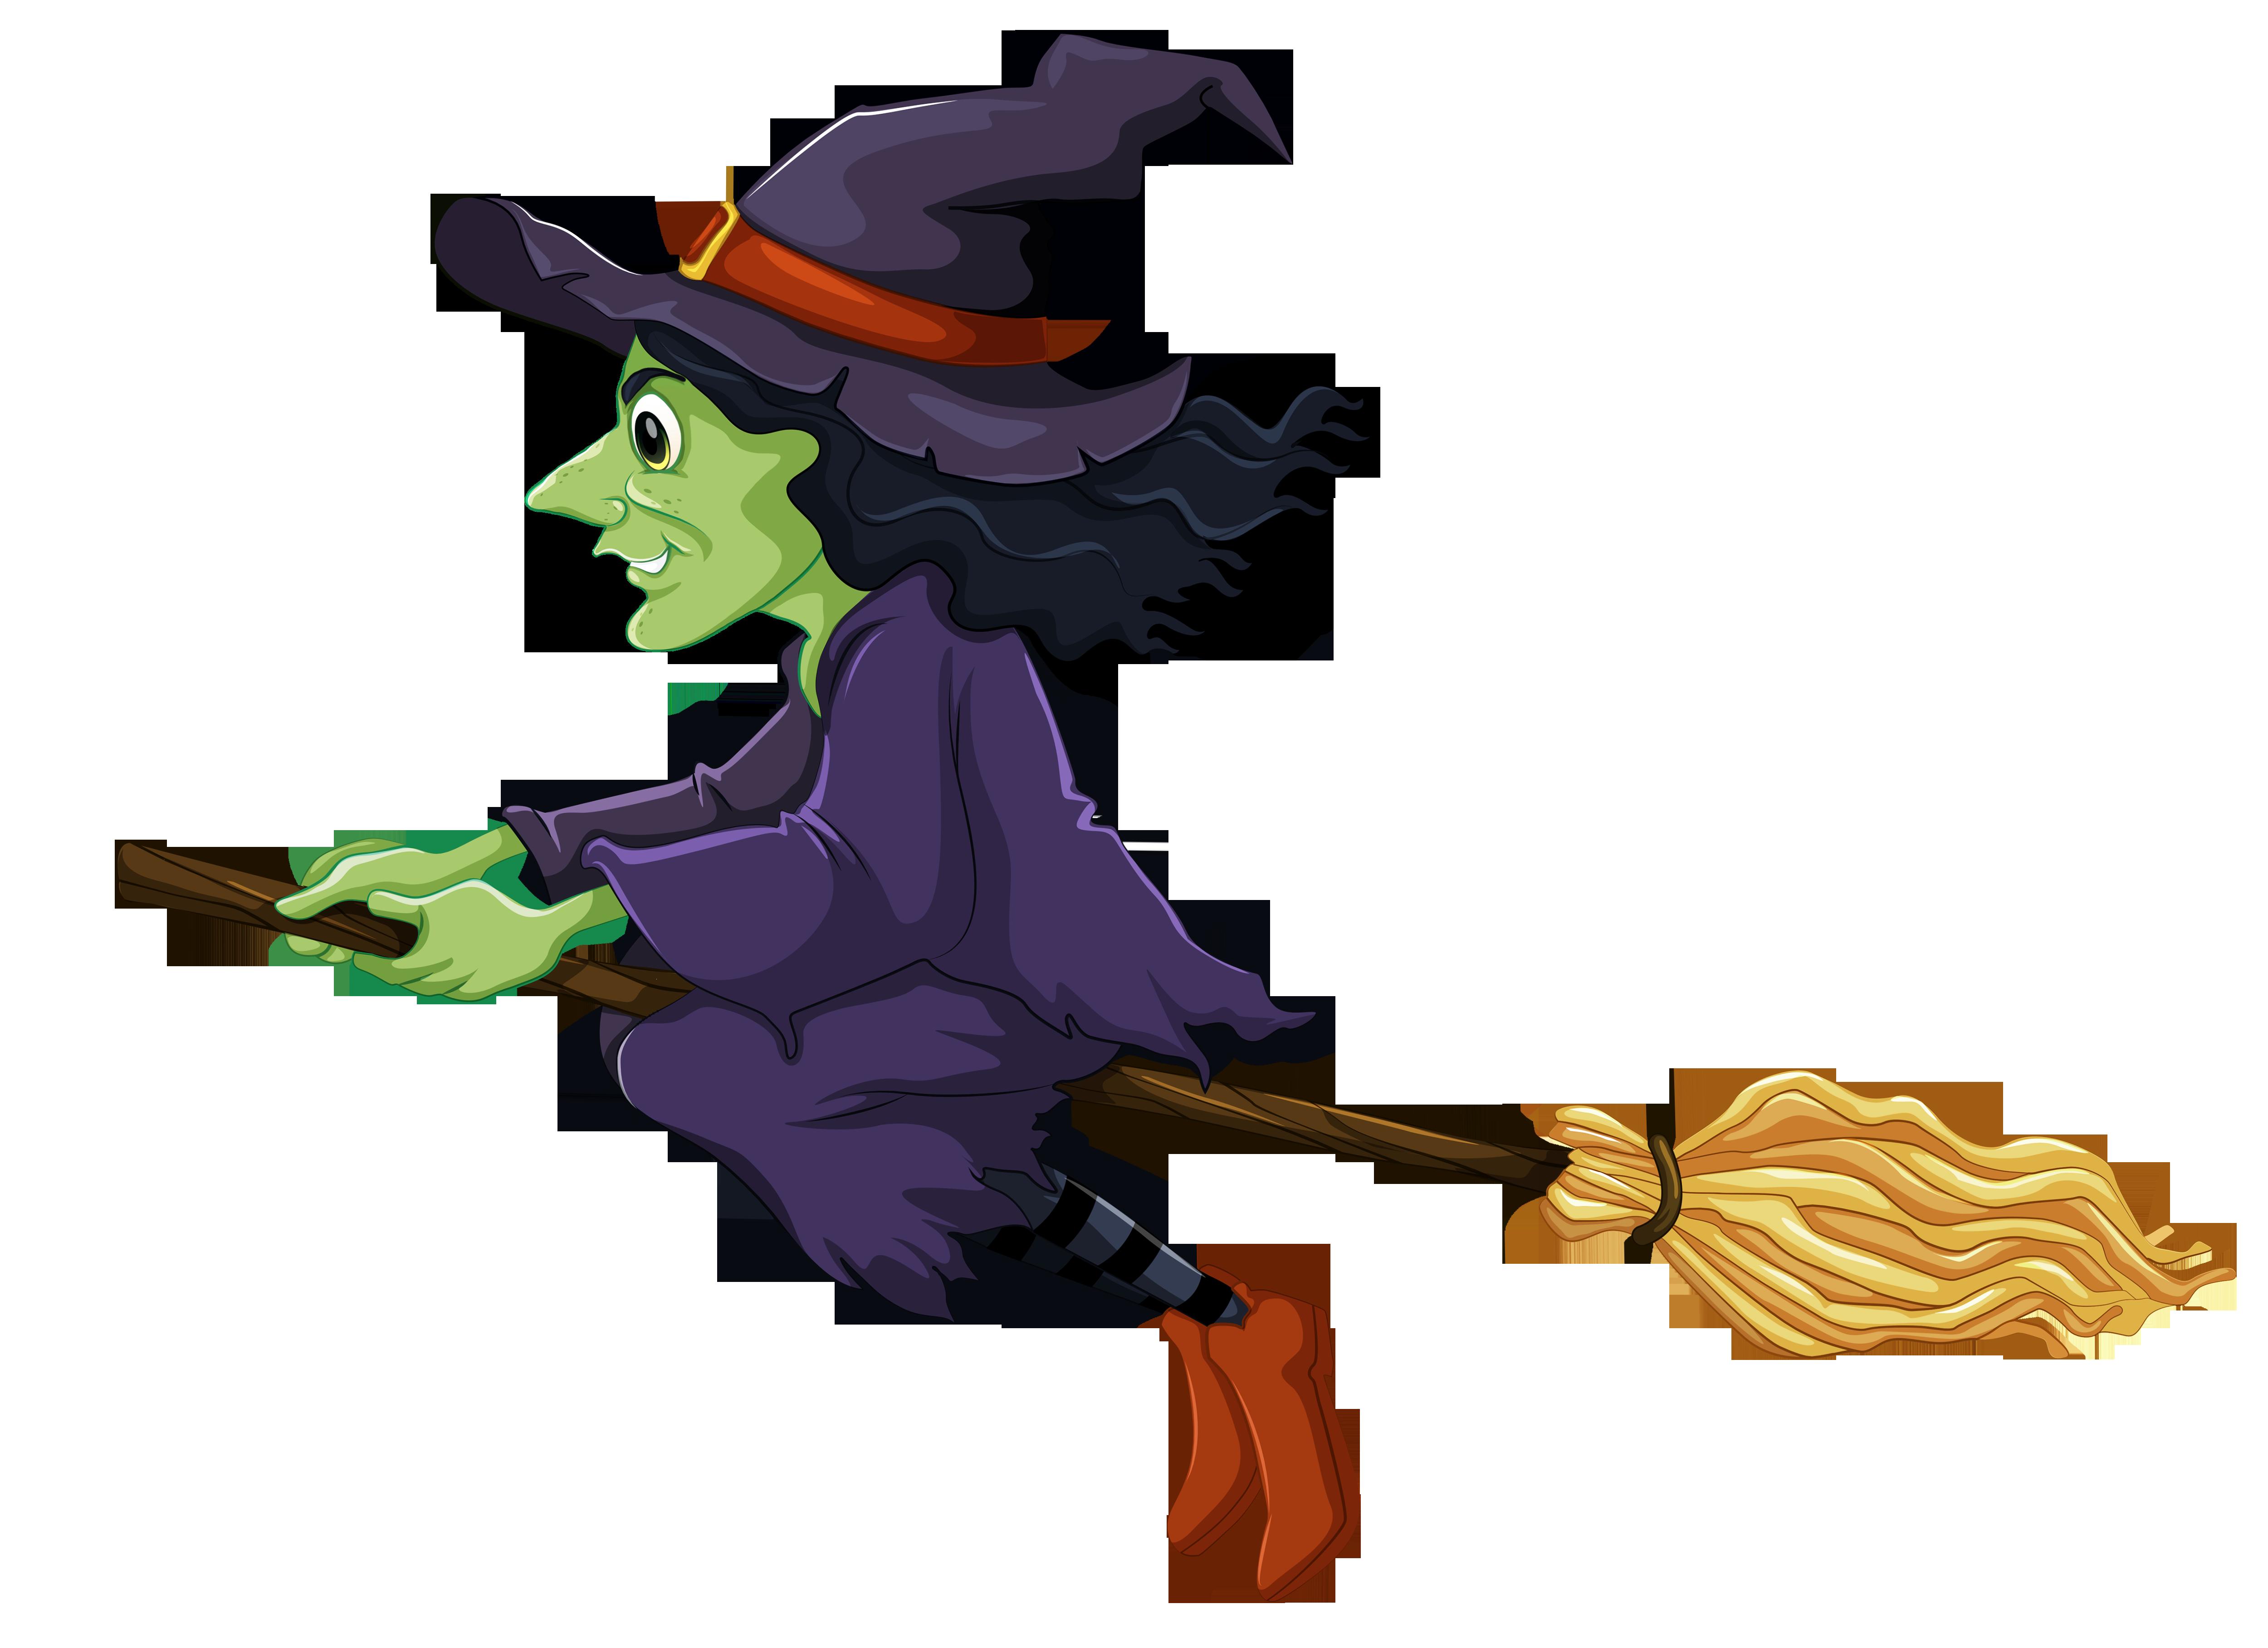 Emma S Trend Fashion And Style Halloween-Emma S Trend Fashion And Style Halloween Witch Clipart-3